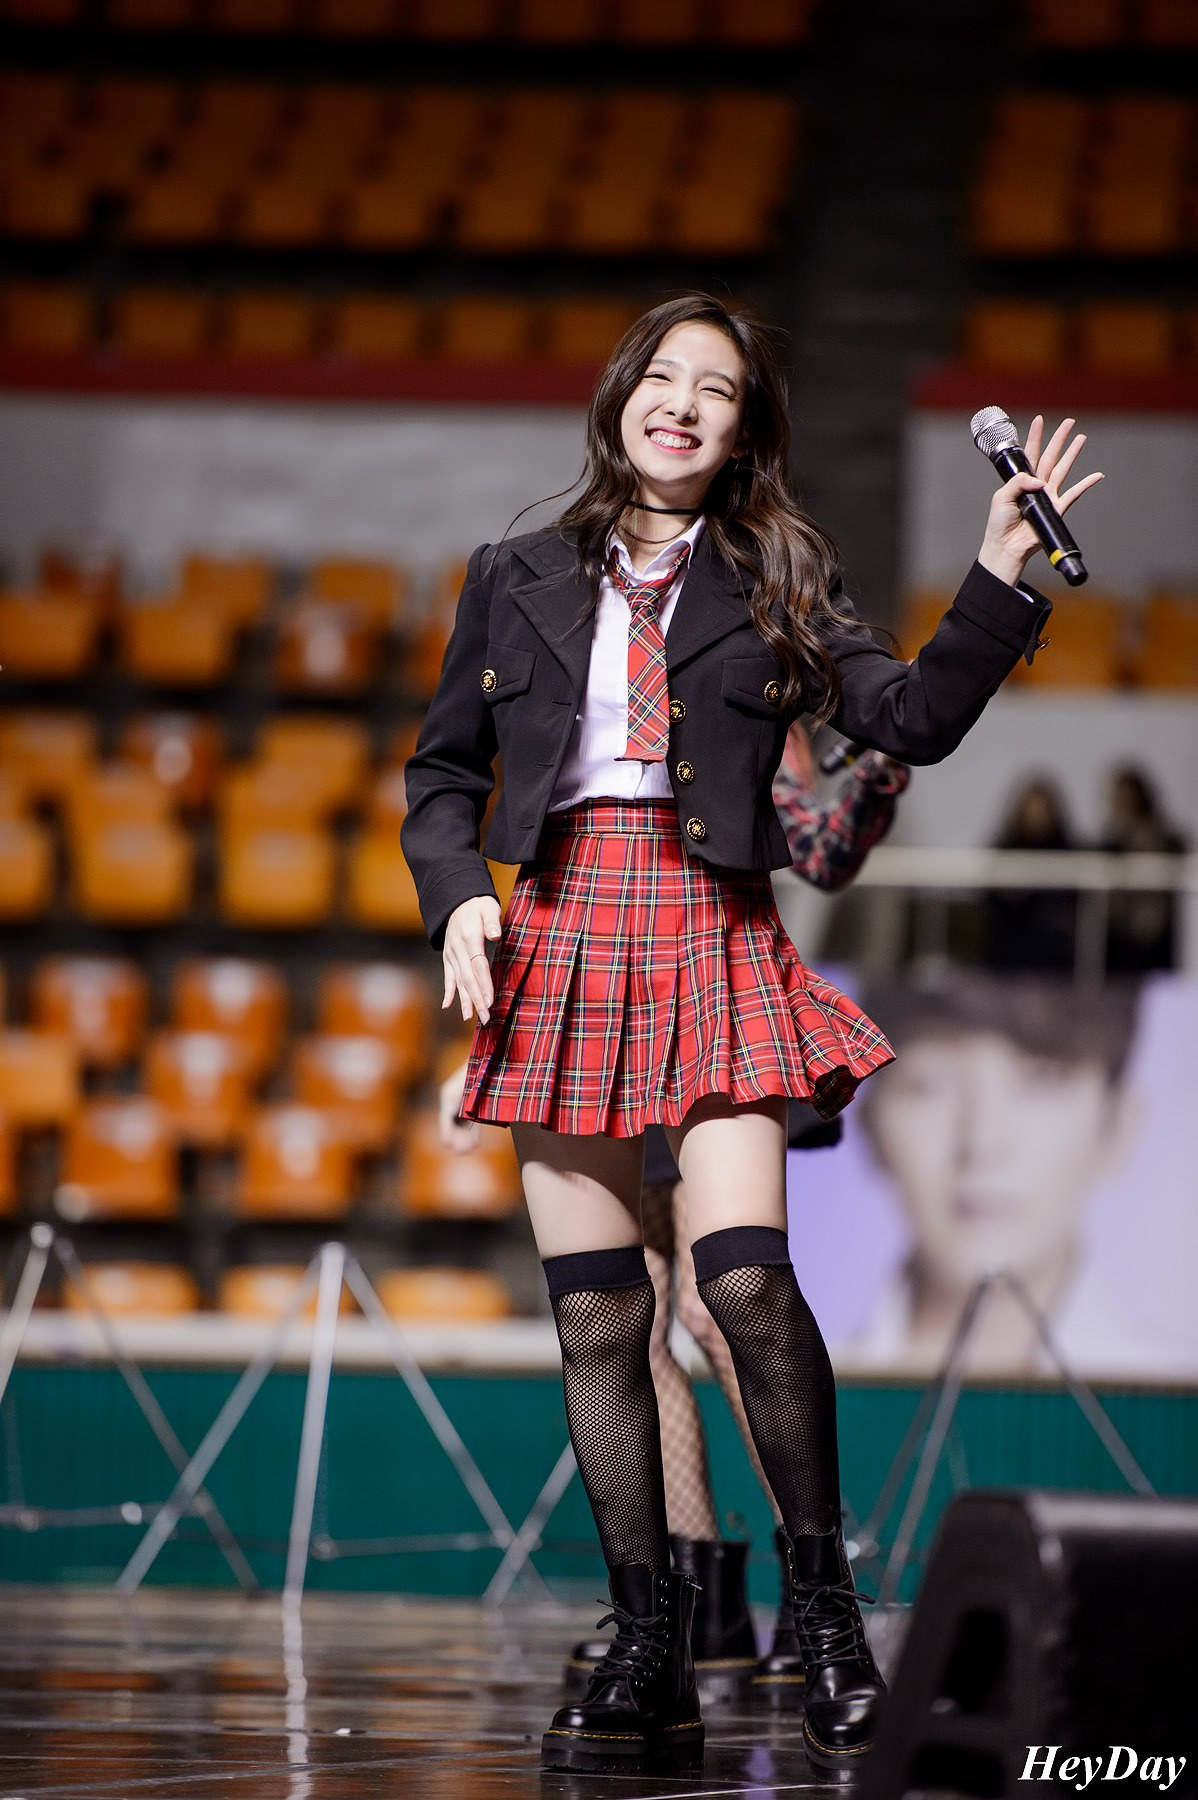 twice nayeon wears sexy fishnet stockings at studio  u2014 koreaboo